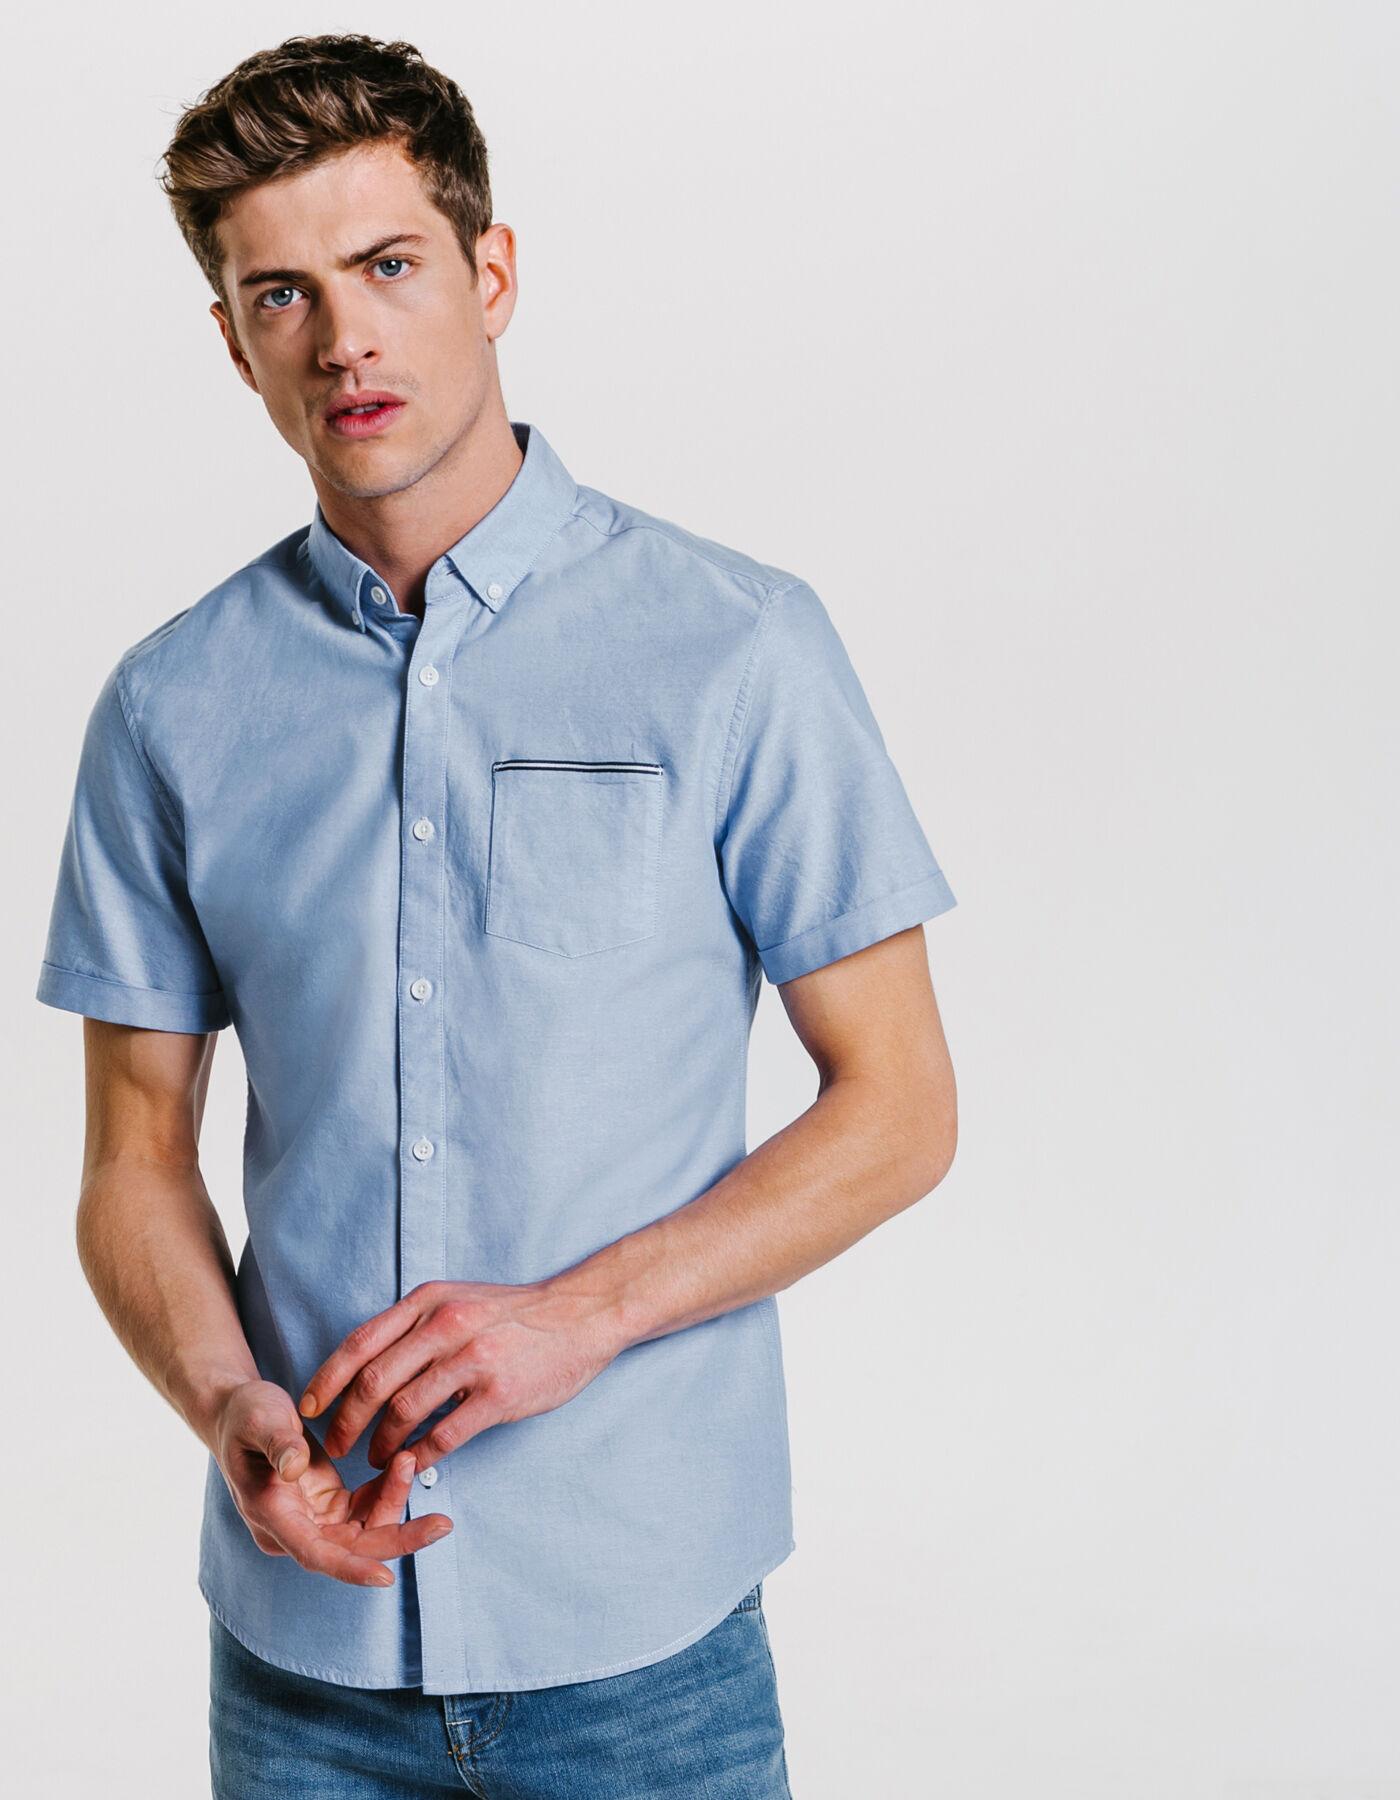 chemise oxford manches courtes bleu ciel homme jules. Black Bedroom Furniture Sets. Home Design Ideas